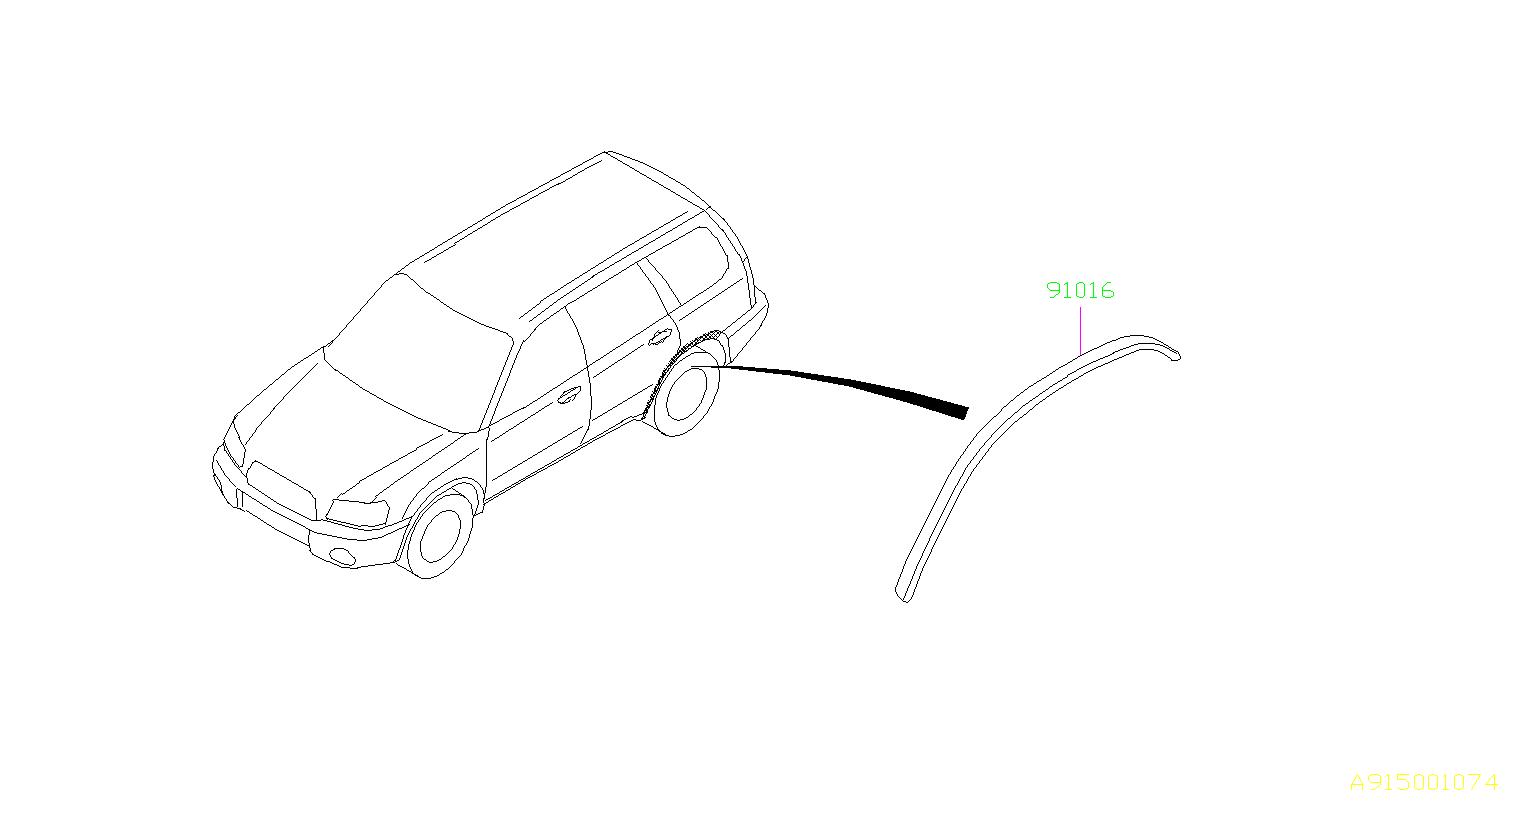 Subaru Forester Protector Rear Arch Right Molding